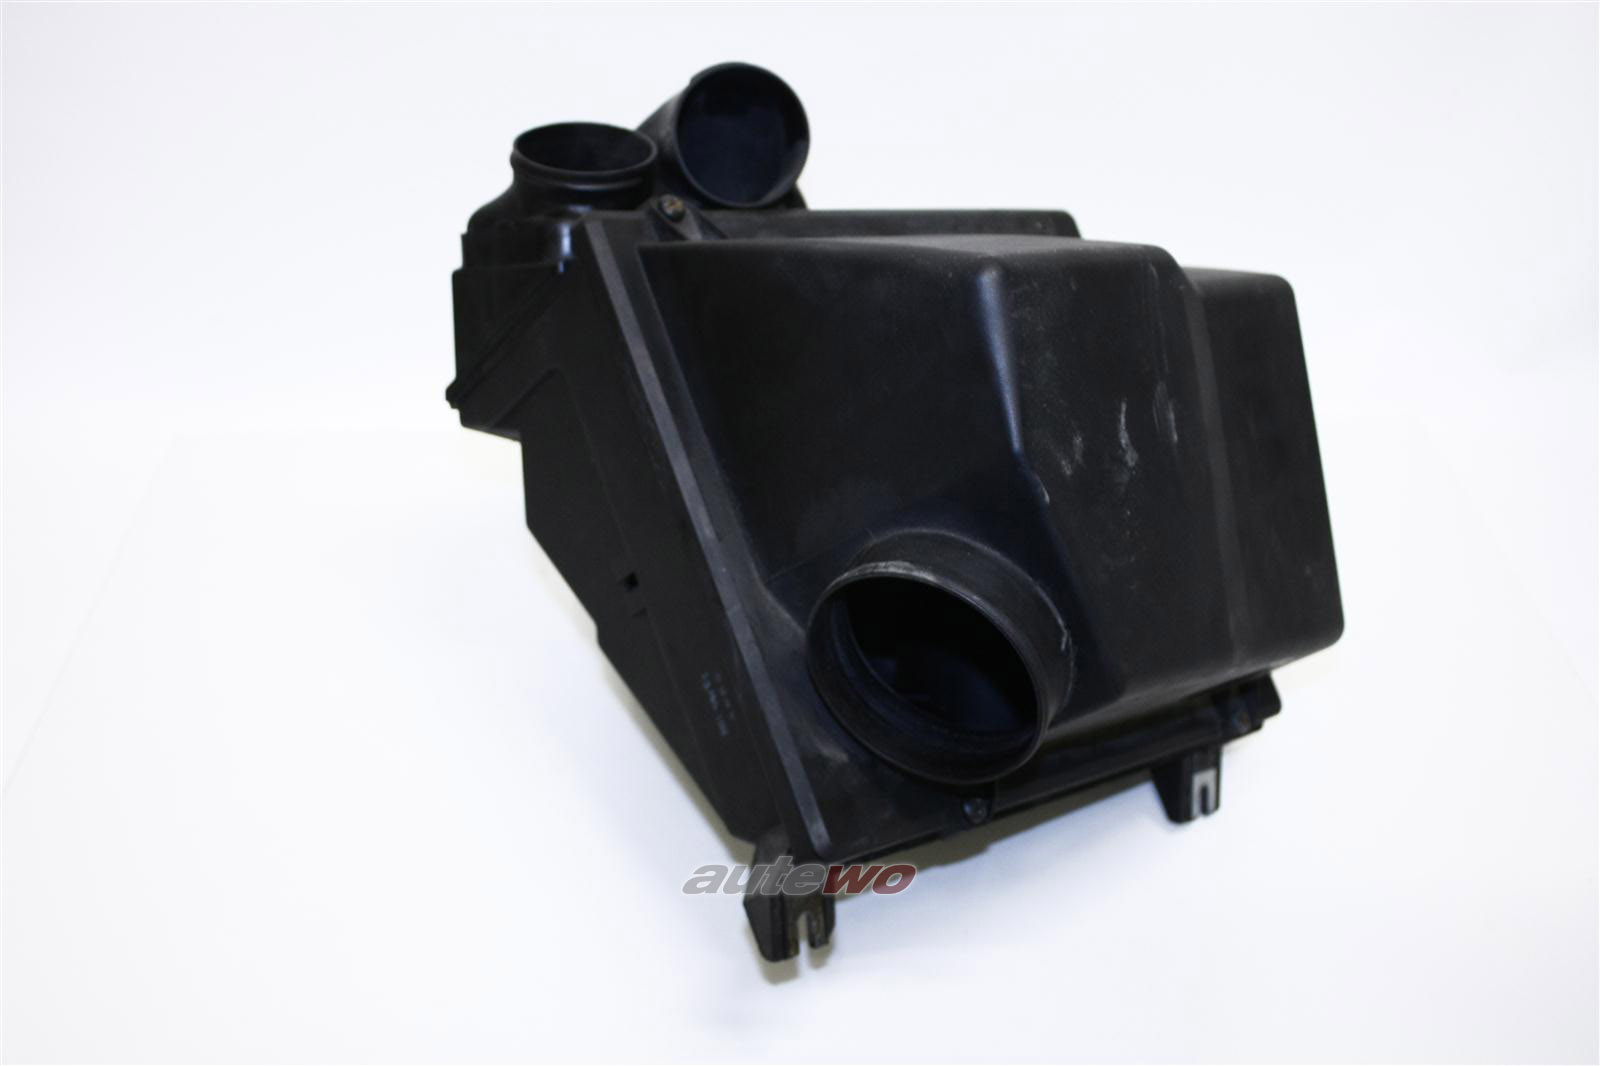 Audi A8 D2 2.8l 193PS 6 Zylinder Luftfilter Kasten 078133837AQ 078133837AR